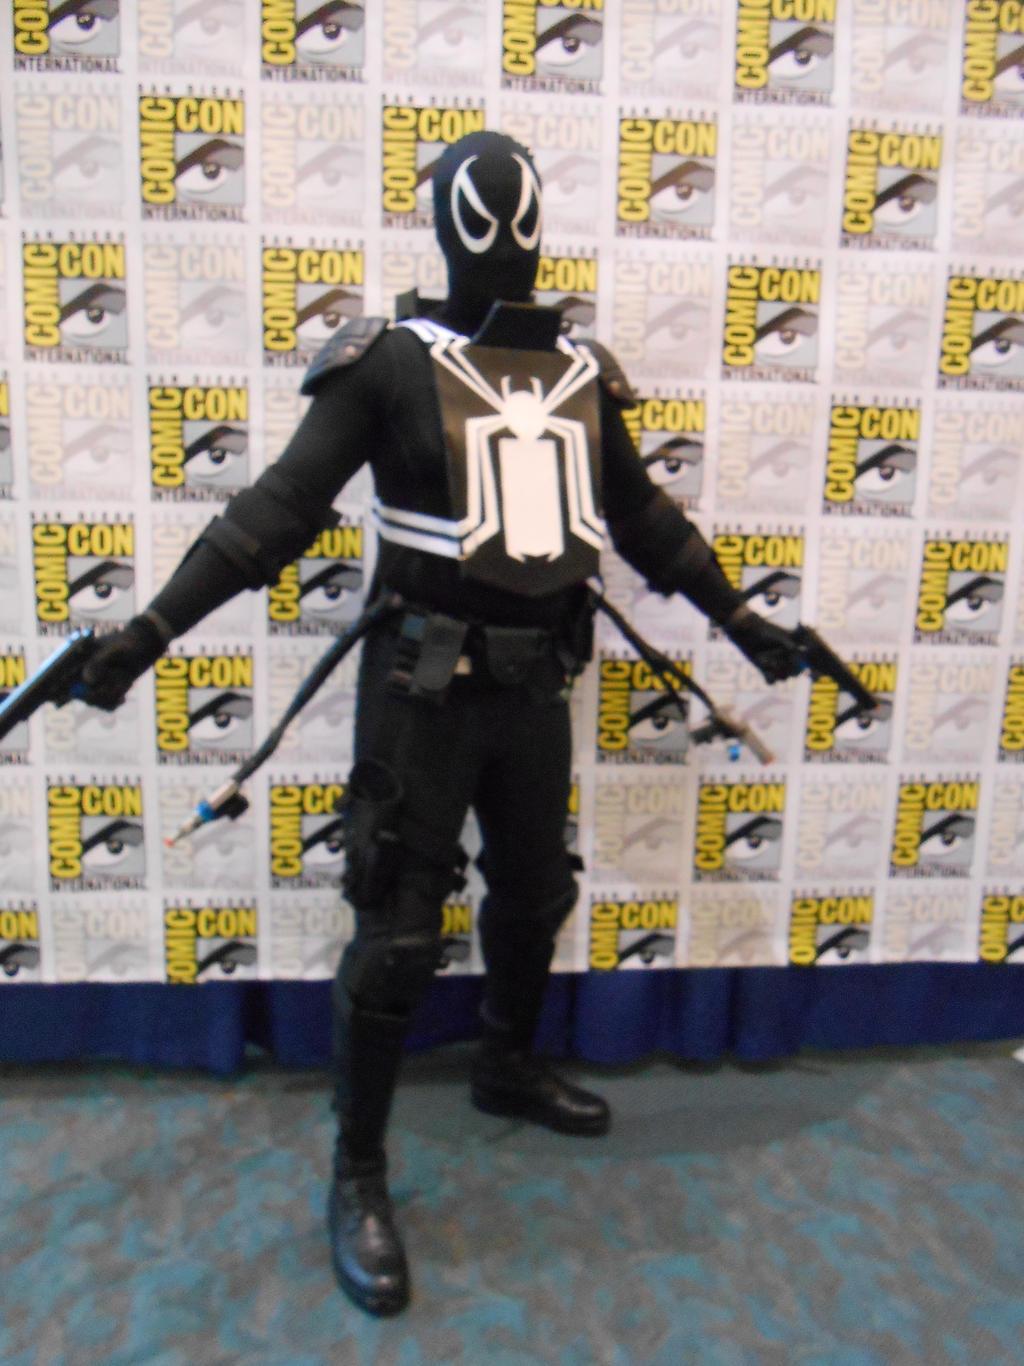 Agent Venom by pa68 on DeviantArt